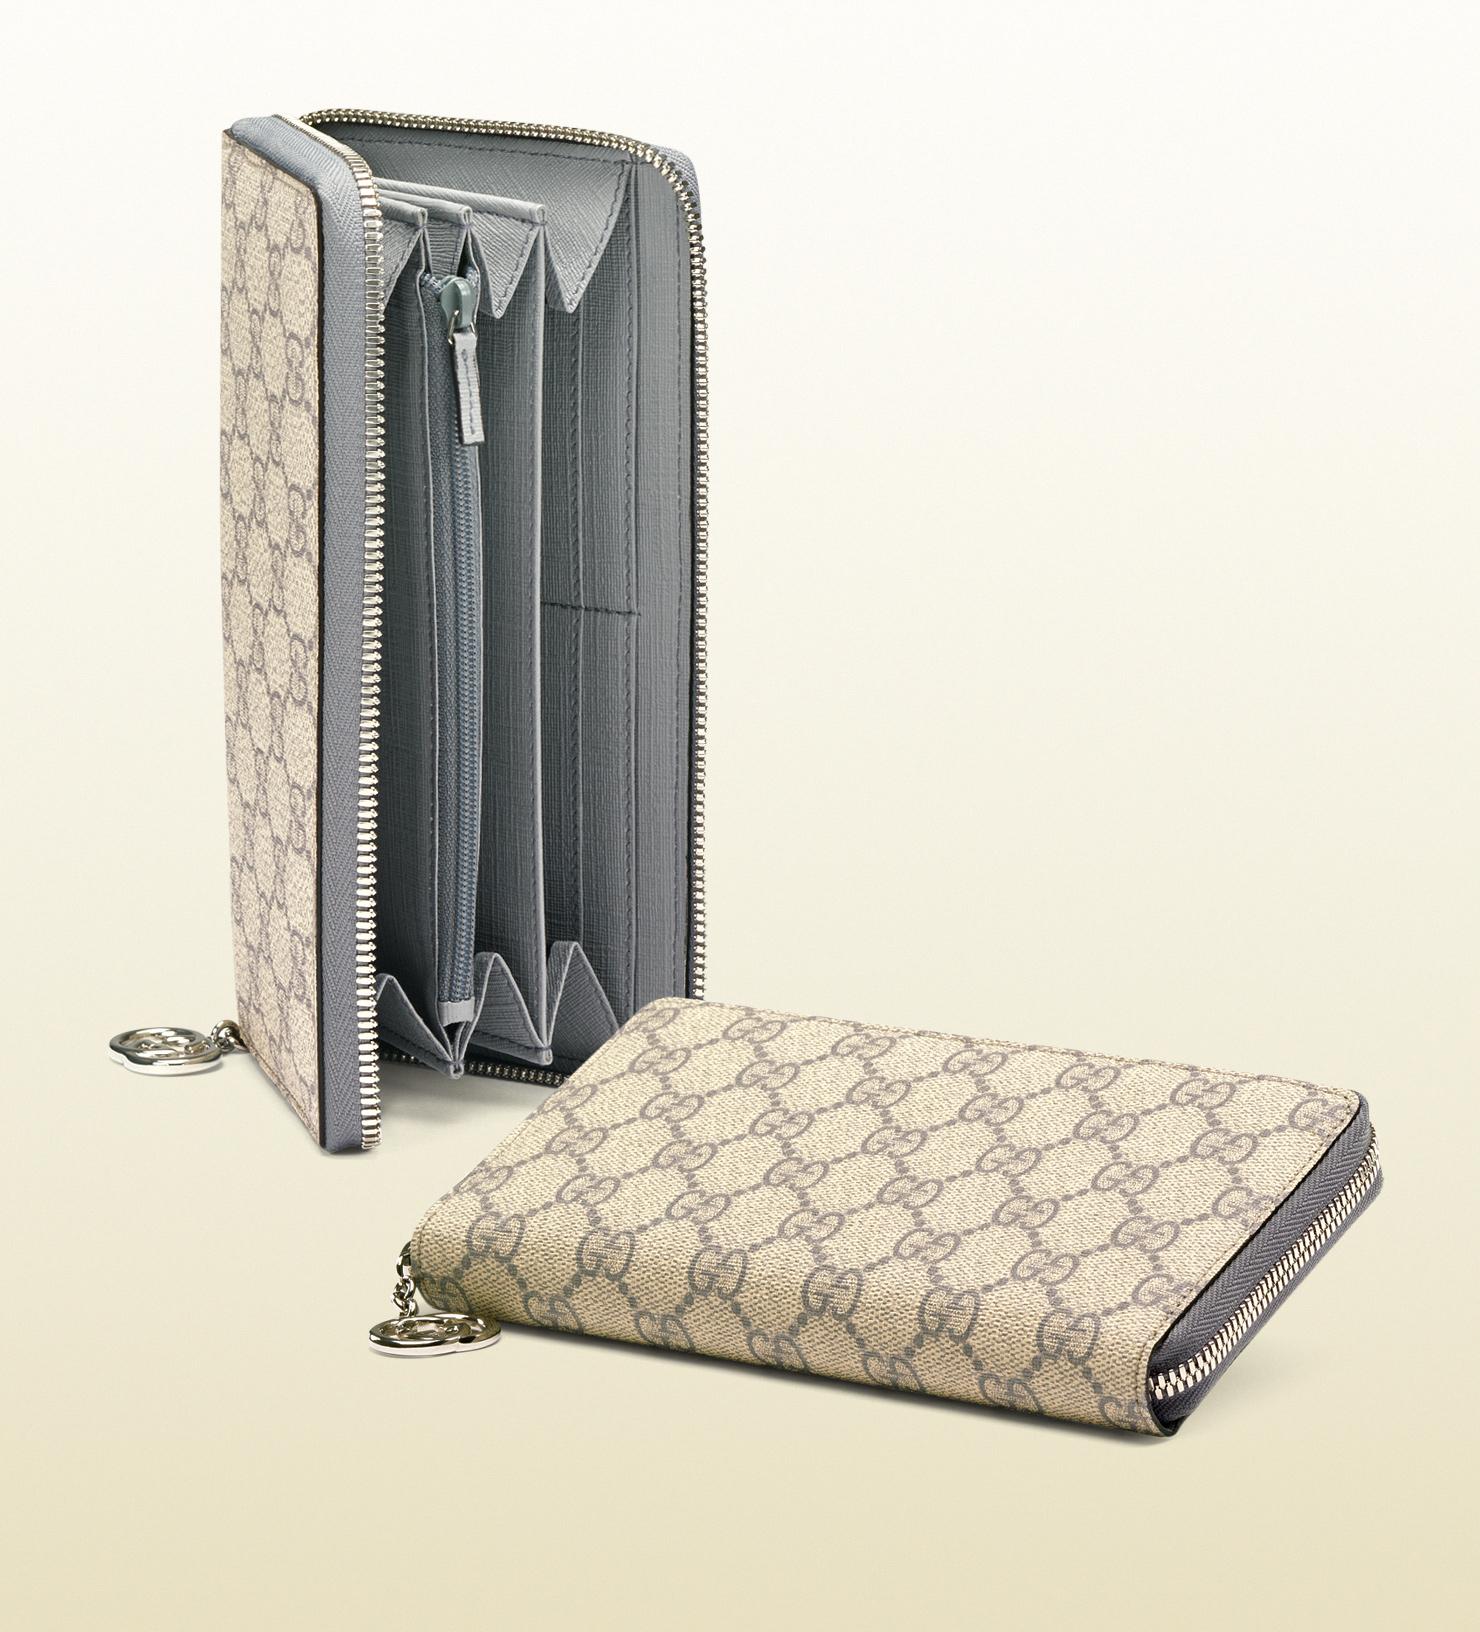 157f2b9e8f8 Lyst - Gucci Gg Supreme Canvas Zip Around Wallet in Gray for Men